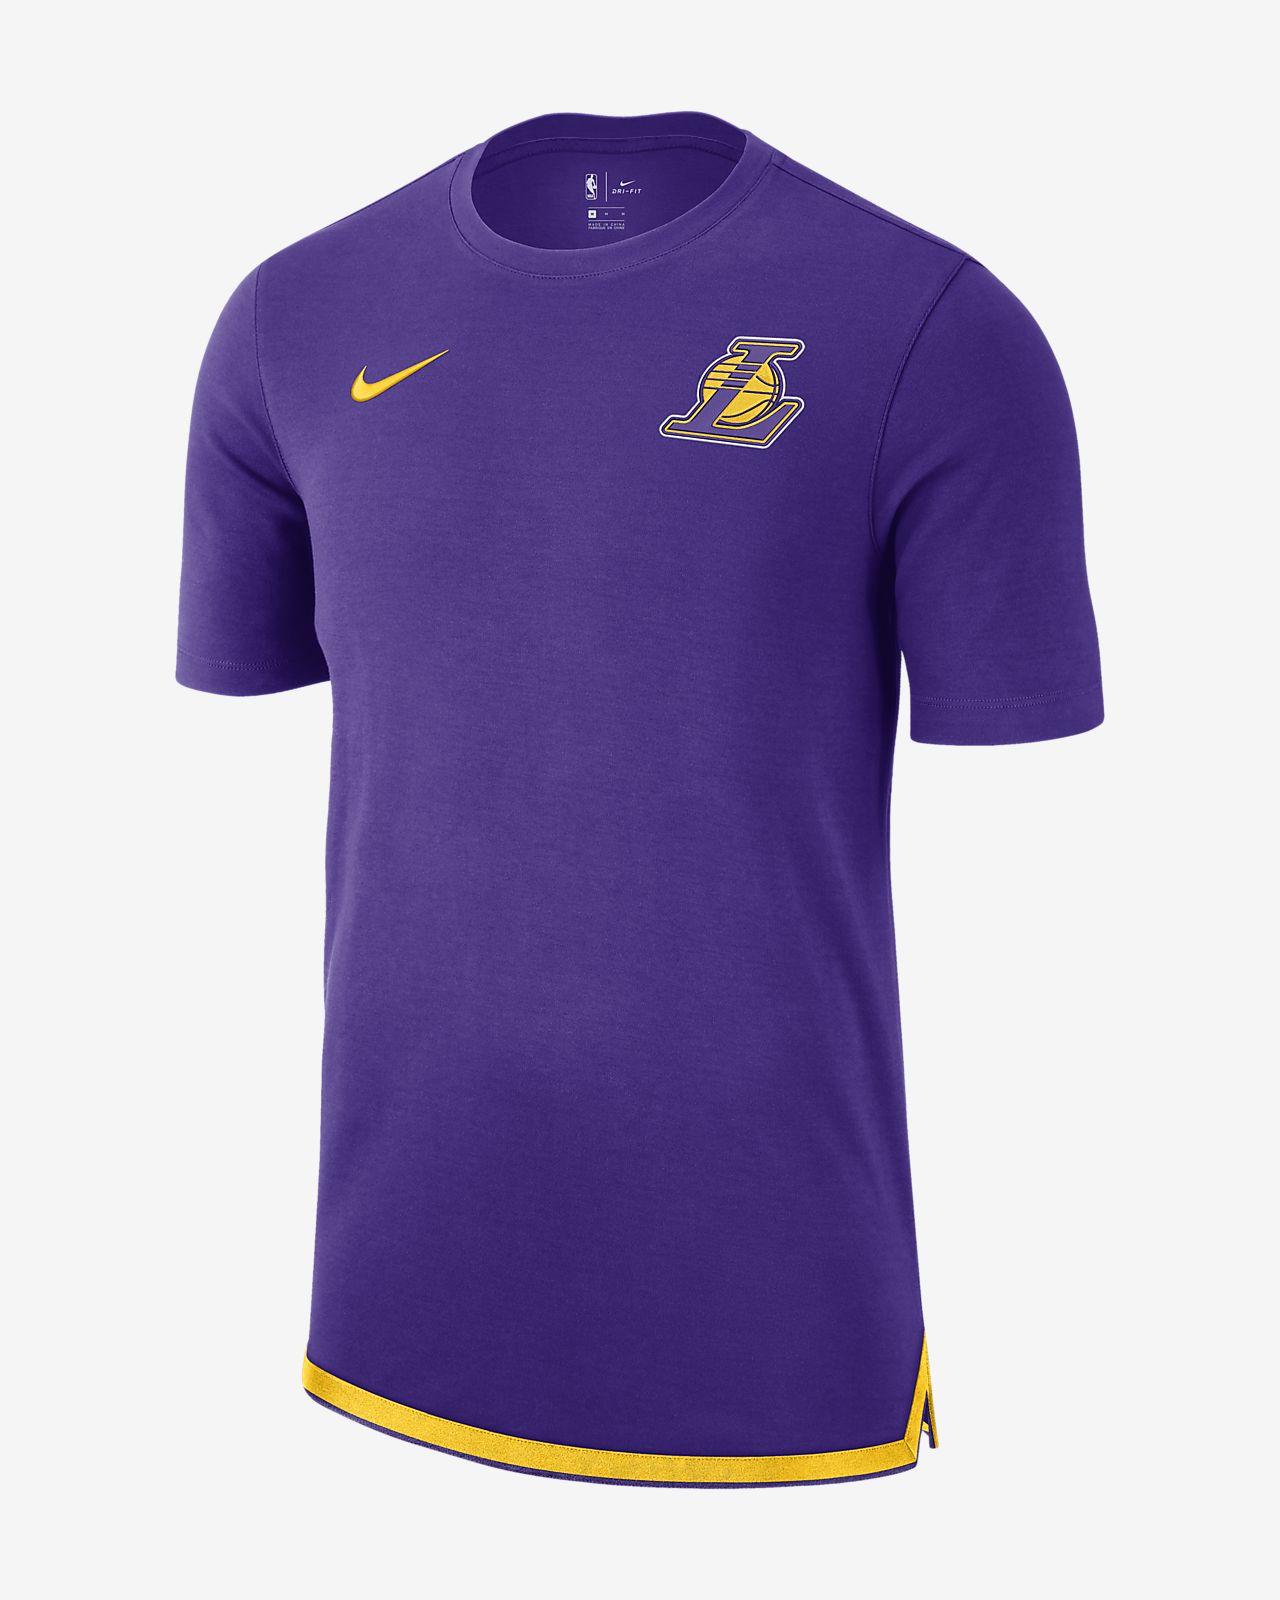 Los Angeles Lakers Nike Men's NBA Top